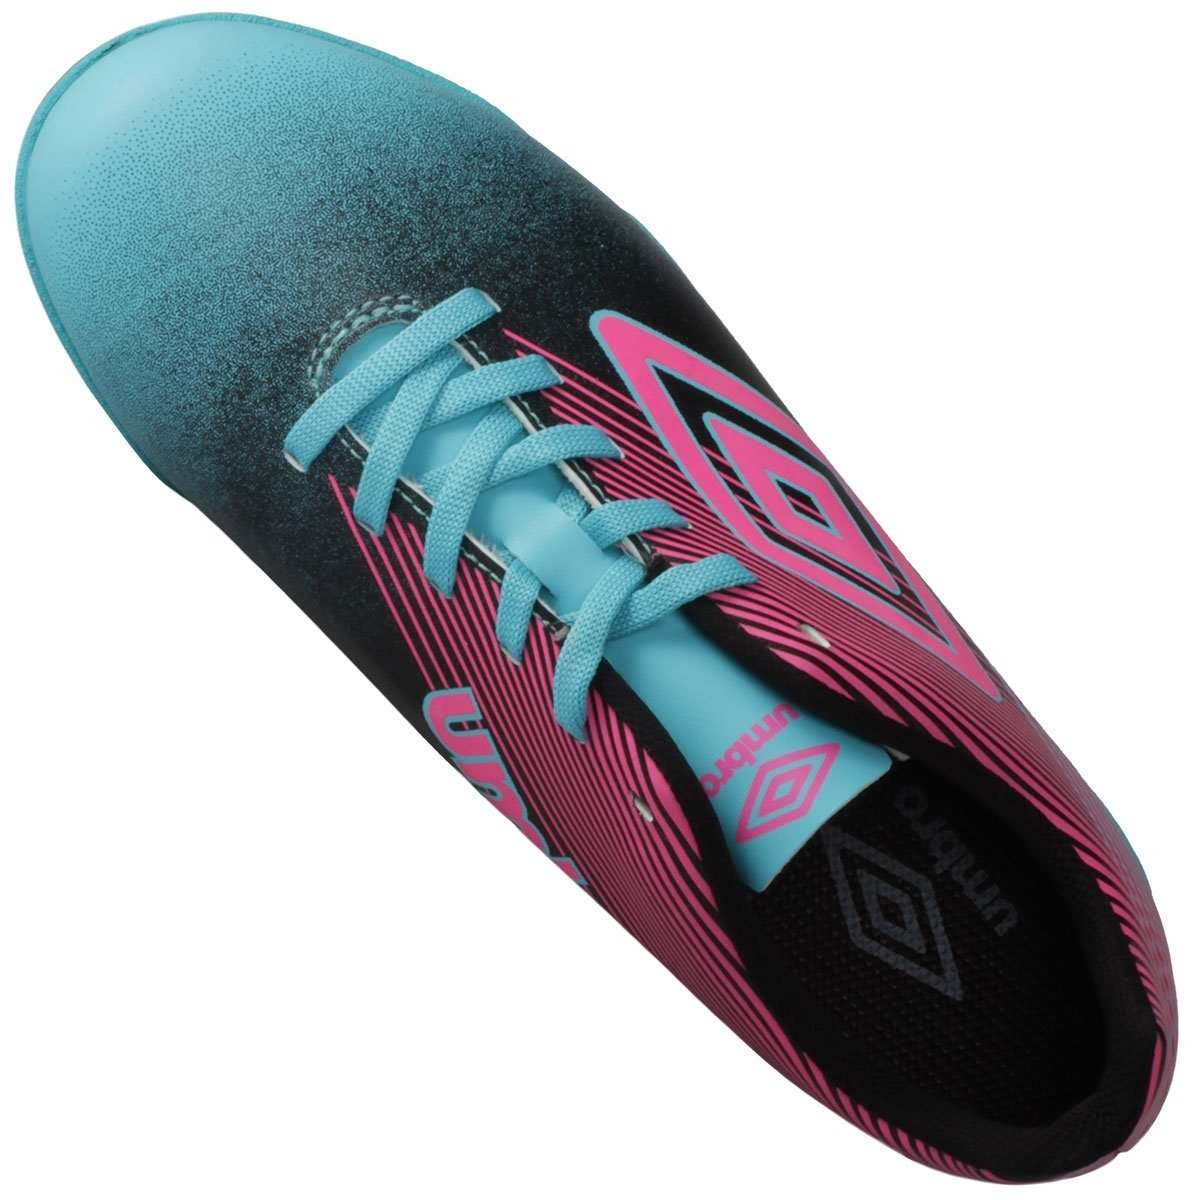 Tênis Umbro Indoor Slice III Futsal - Compre Agora  0bace12a3507f